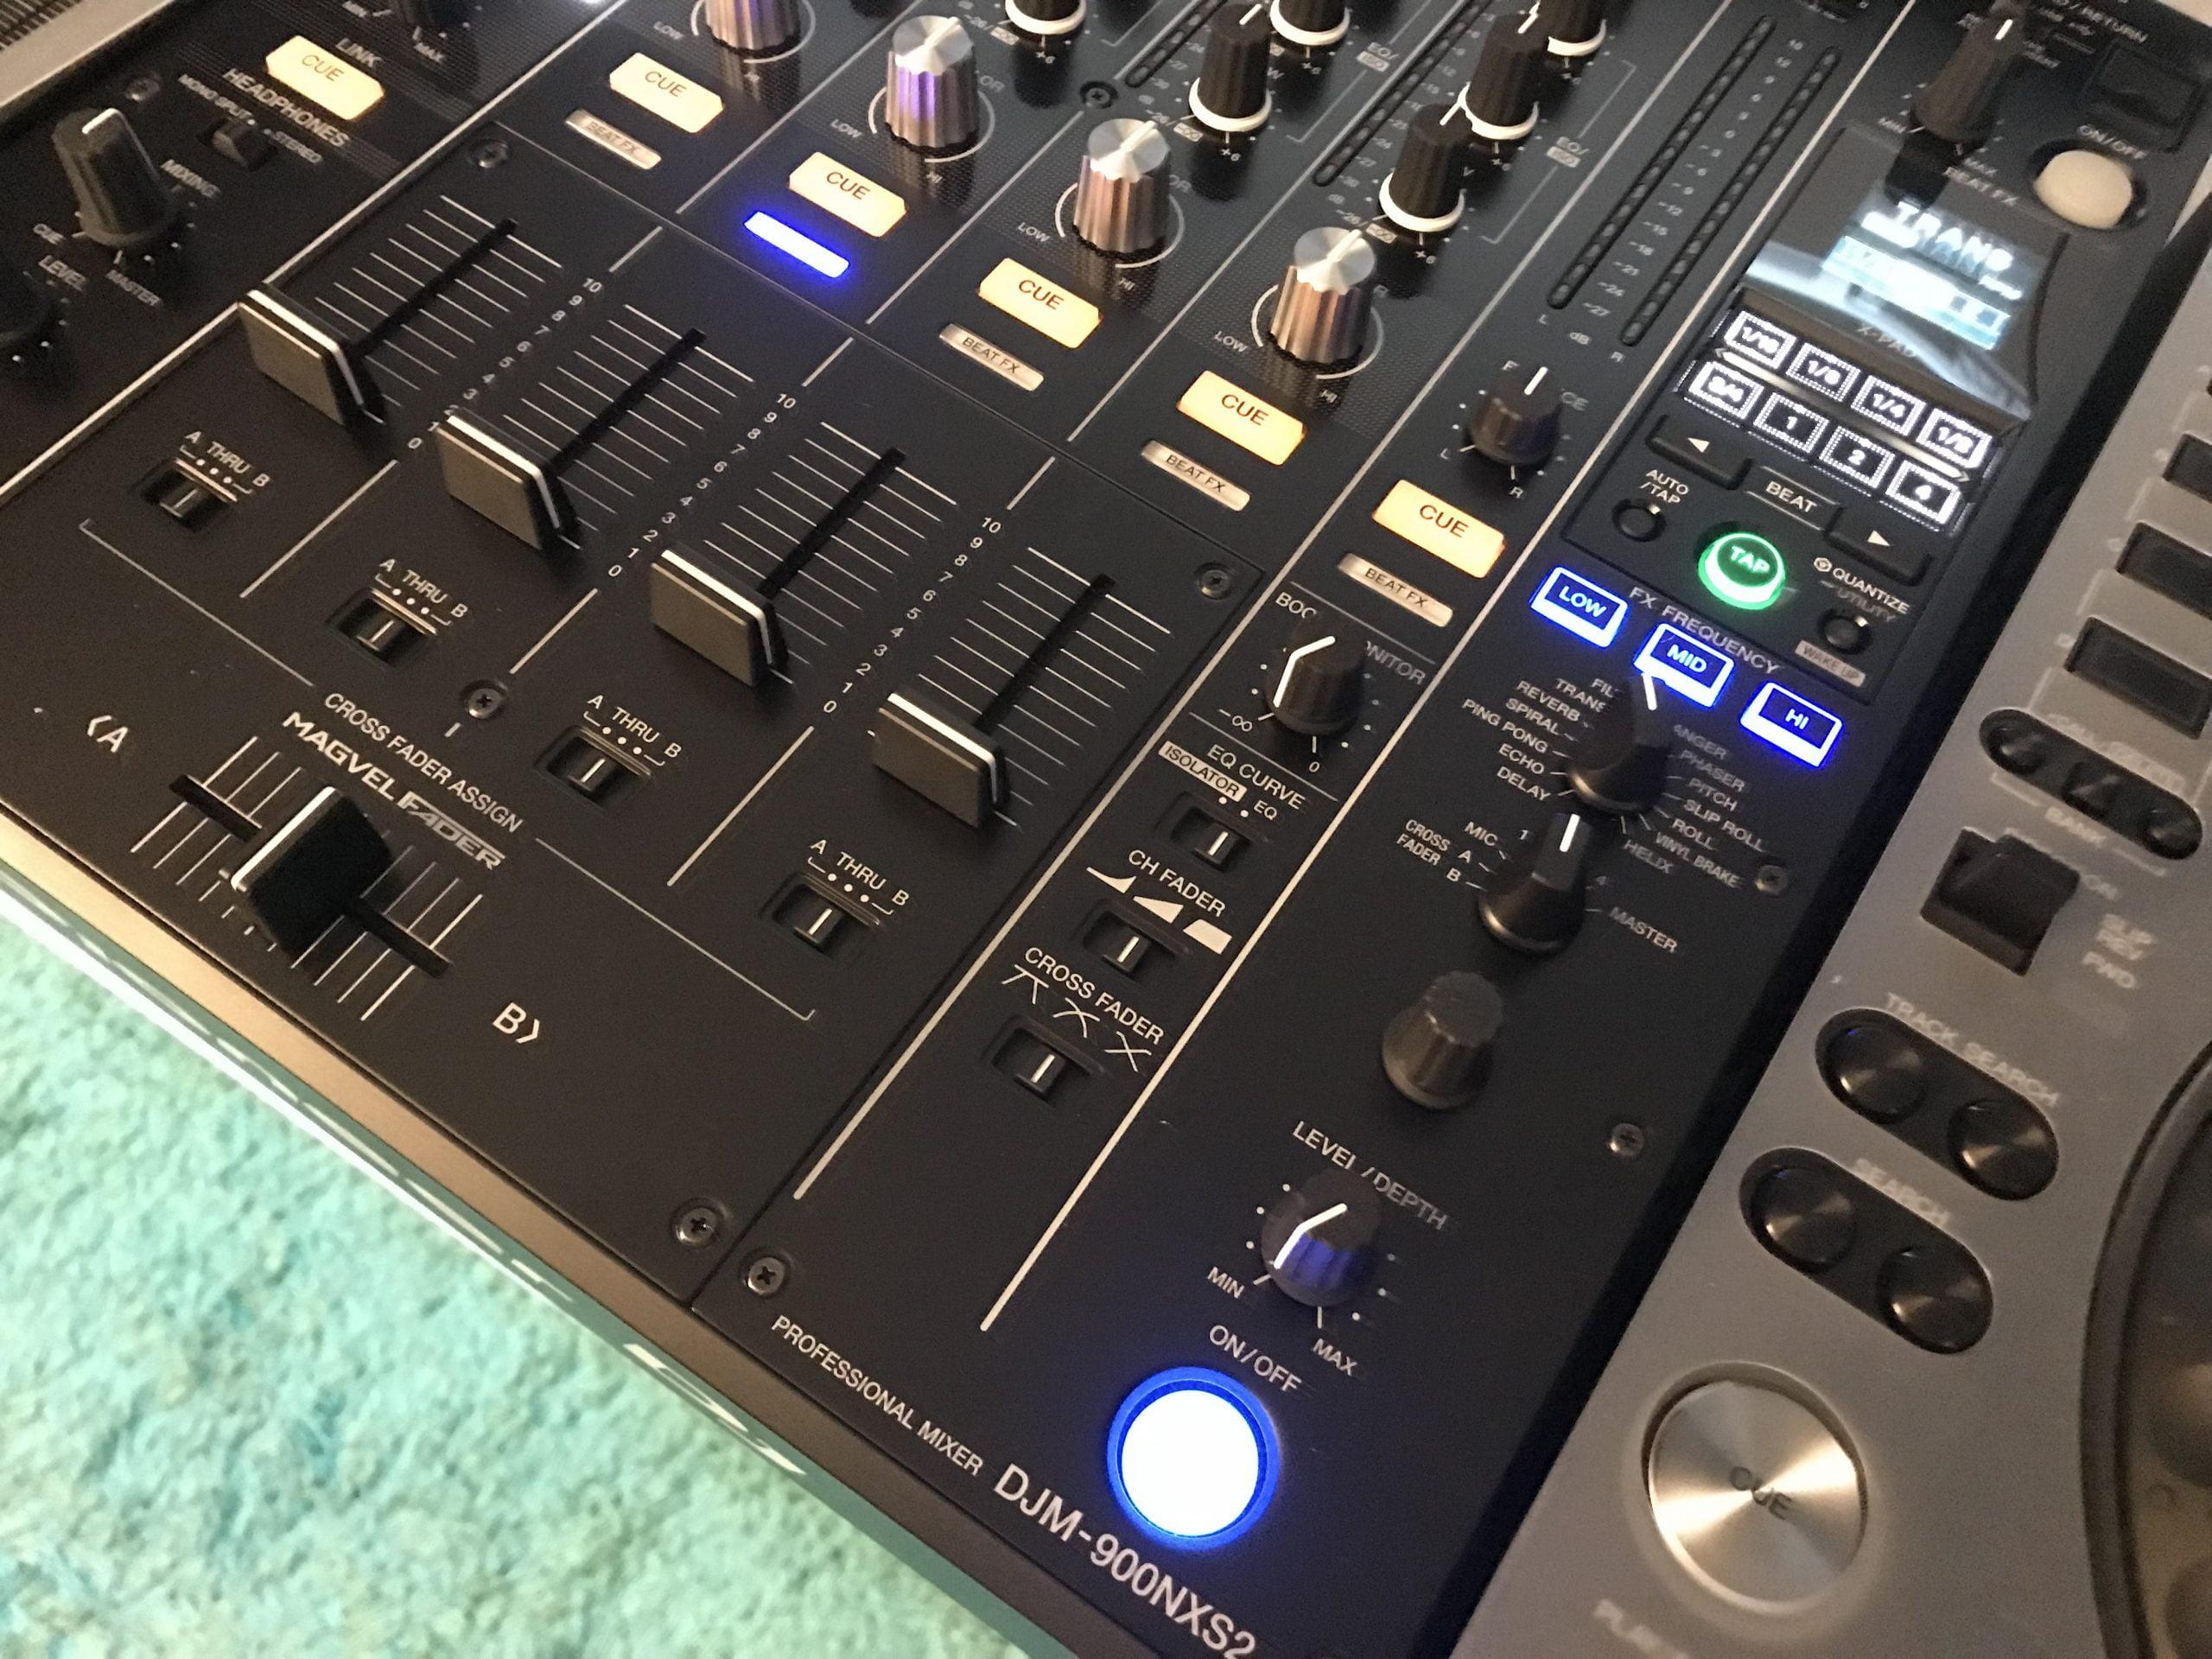 https://ministryofdjs.com.sg/wp-content/uploads/2021/06/Intermediate-DJ-Course-scaled.jpg